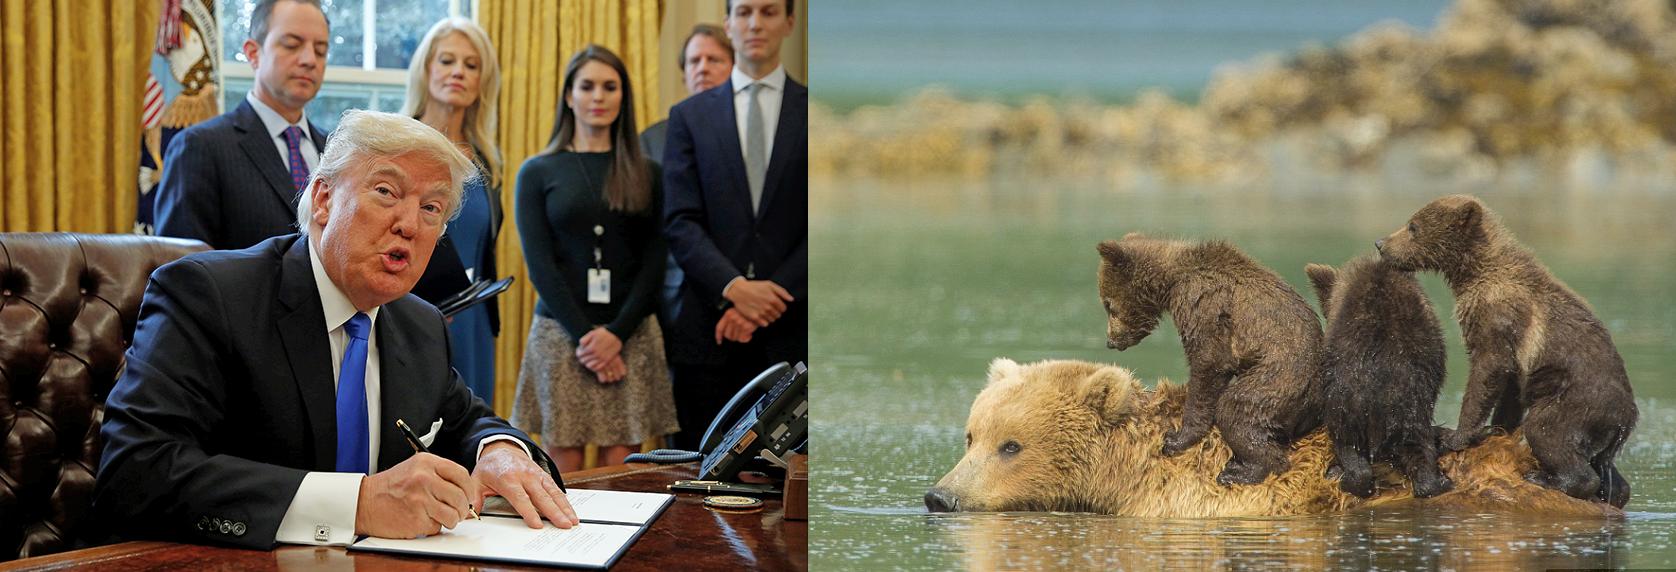 Bill Allowing Slaughter of Alaskan Bear Cubs, Wolf Pups, Sails Through Senate to Trump's Desk